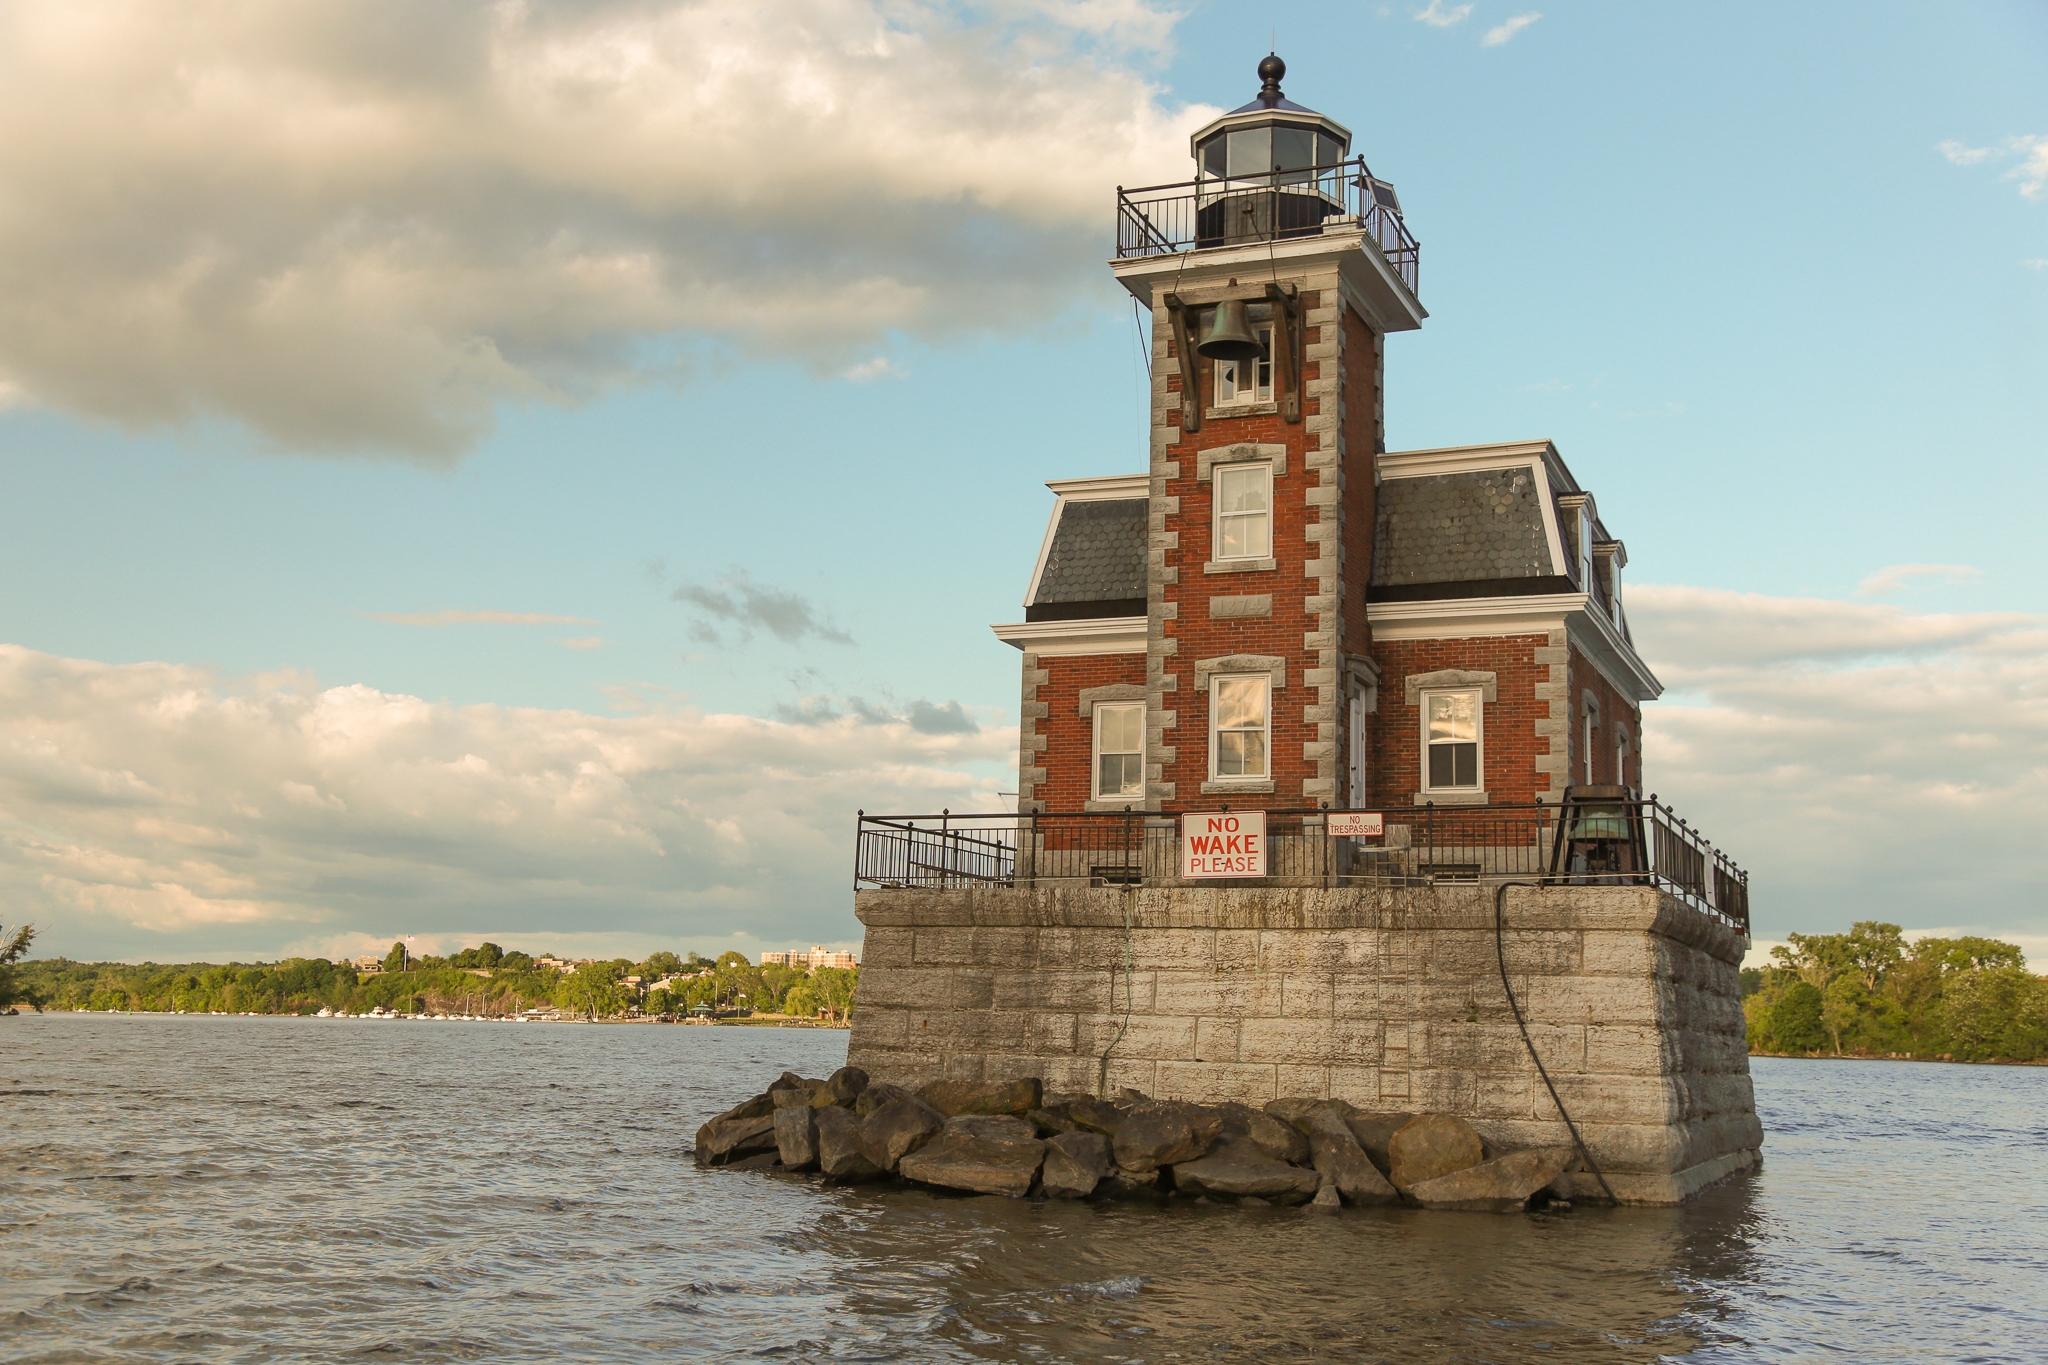 Hudson_Athens_lighthouse_0010.jpg